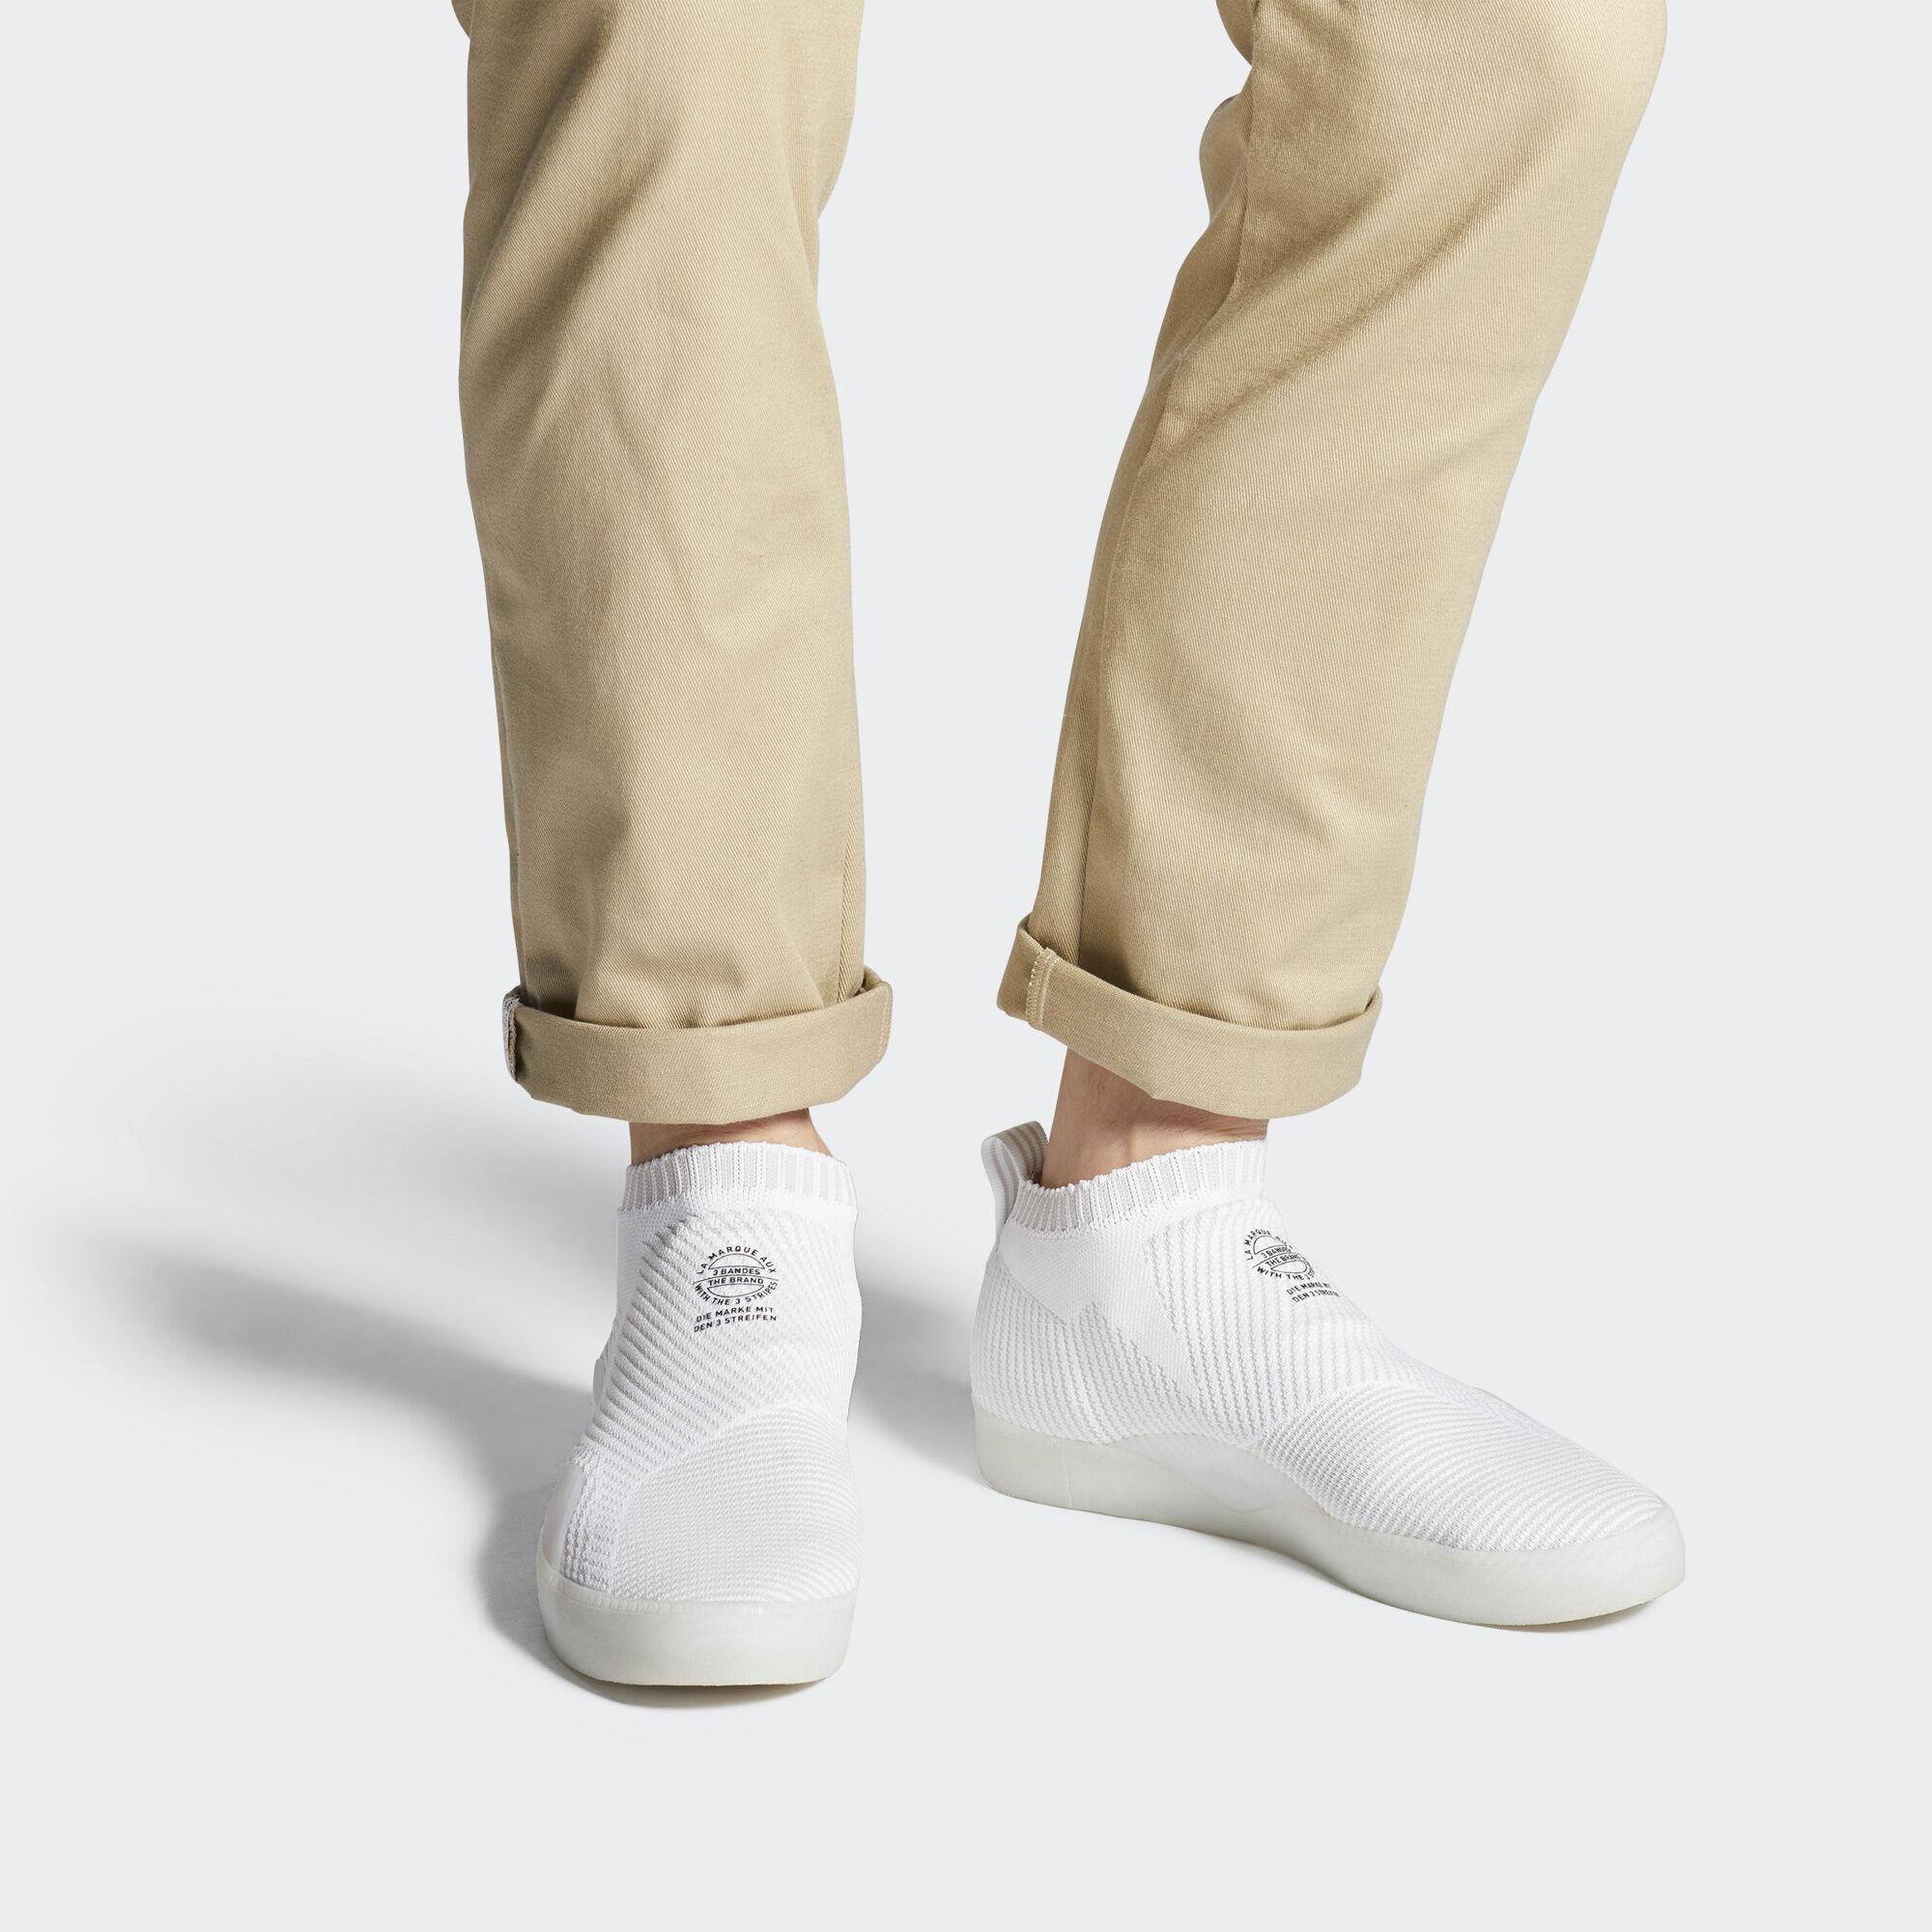 adidas 3ST.002 Primeknit Shoes - Black  7f30dfbba